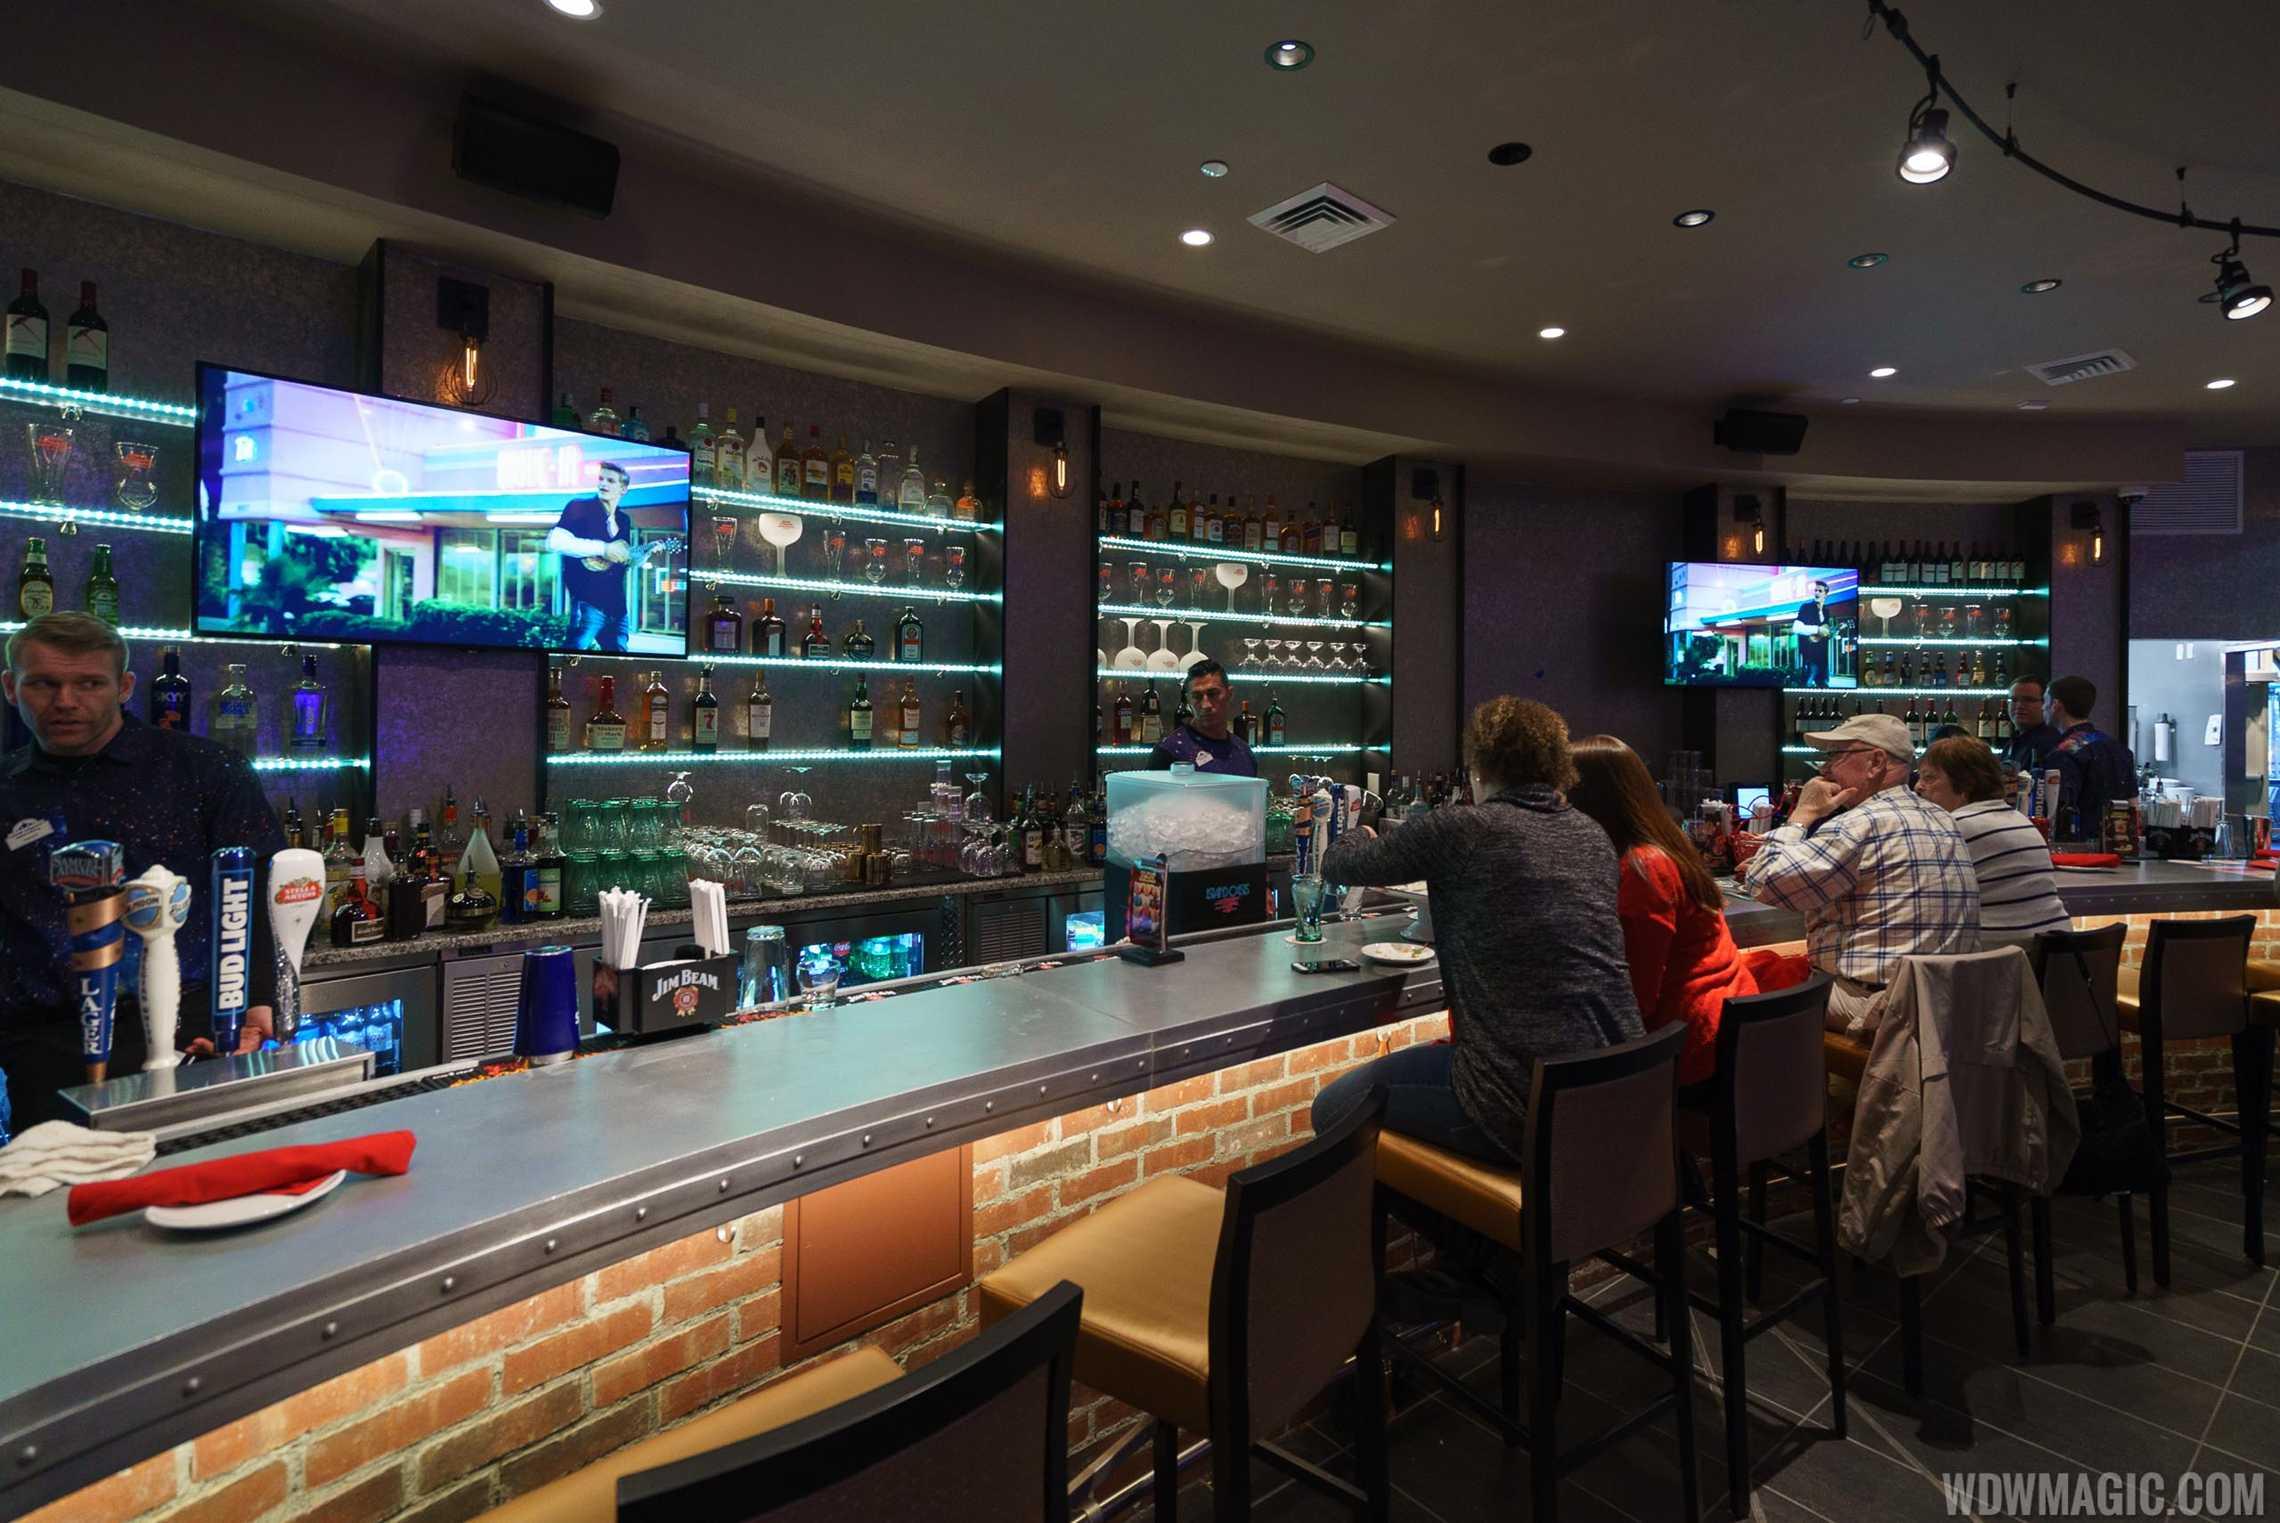 Planet Hollywood Observatory - Lower level bar